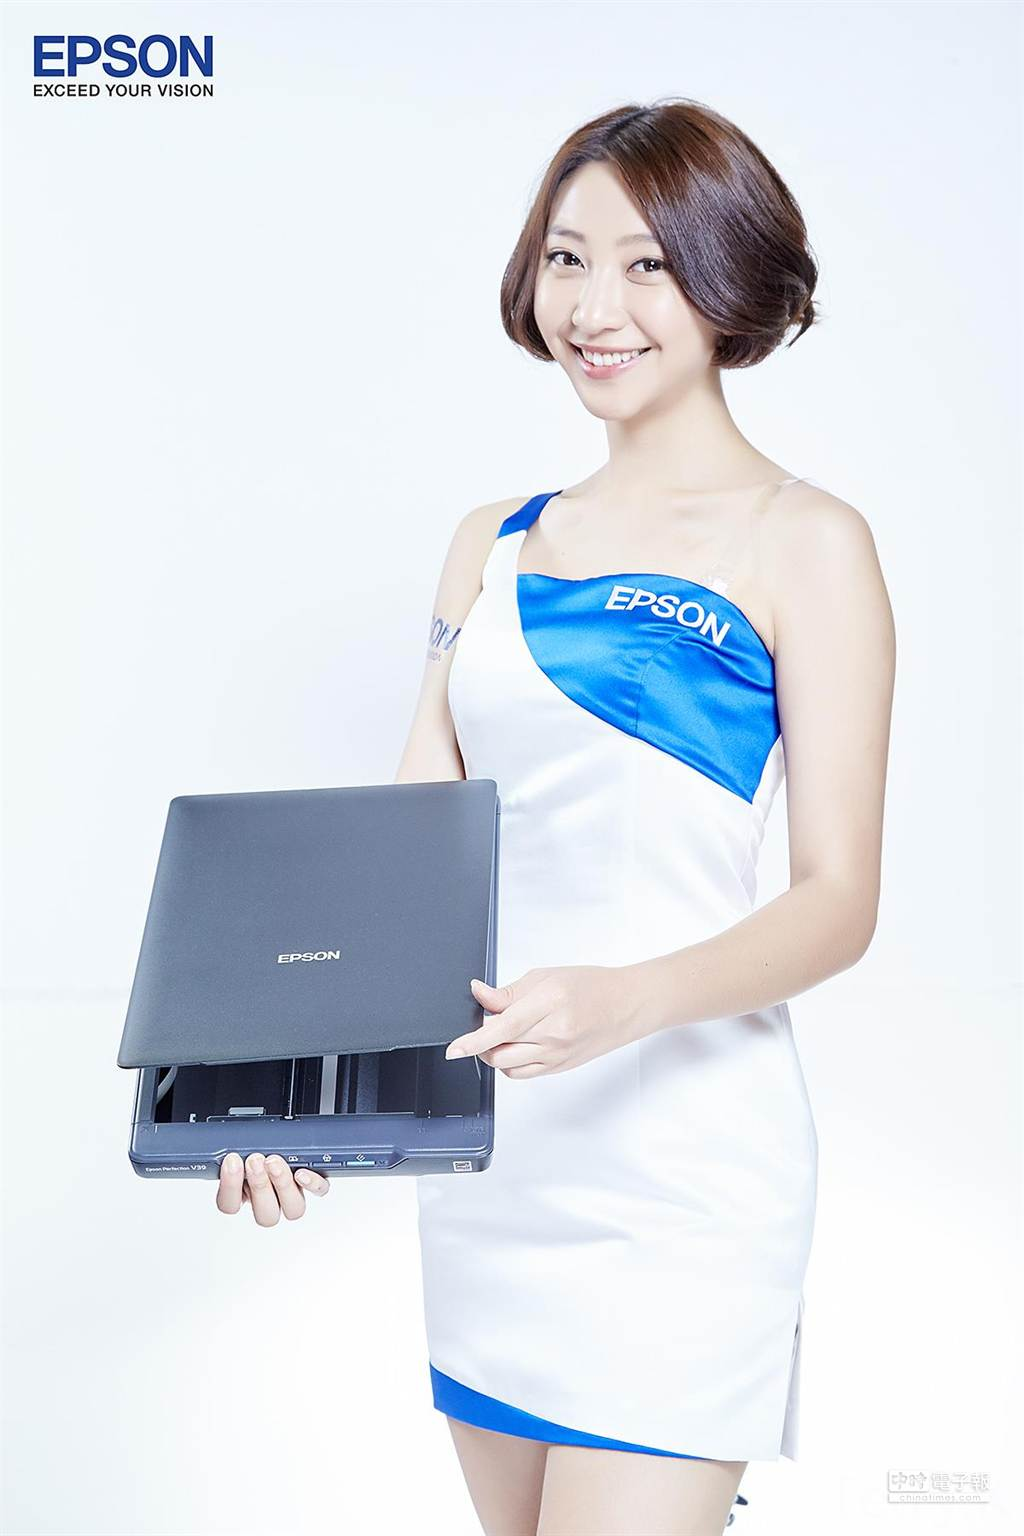 Epson8月3日推出挾取紙鈔最高的參賽者,可用99元鈔集價挾回掃描器。(圖/業者提供)